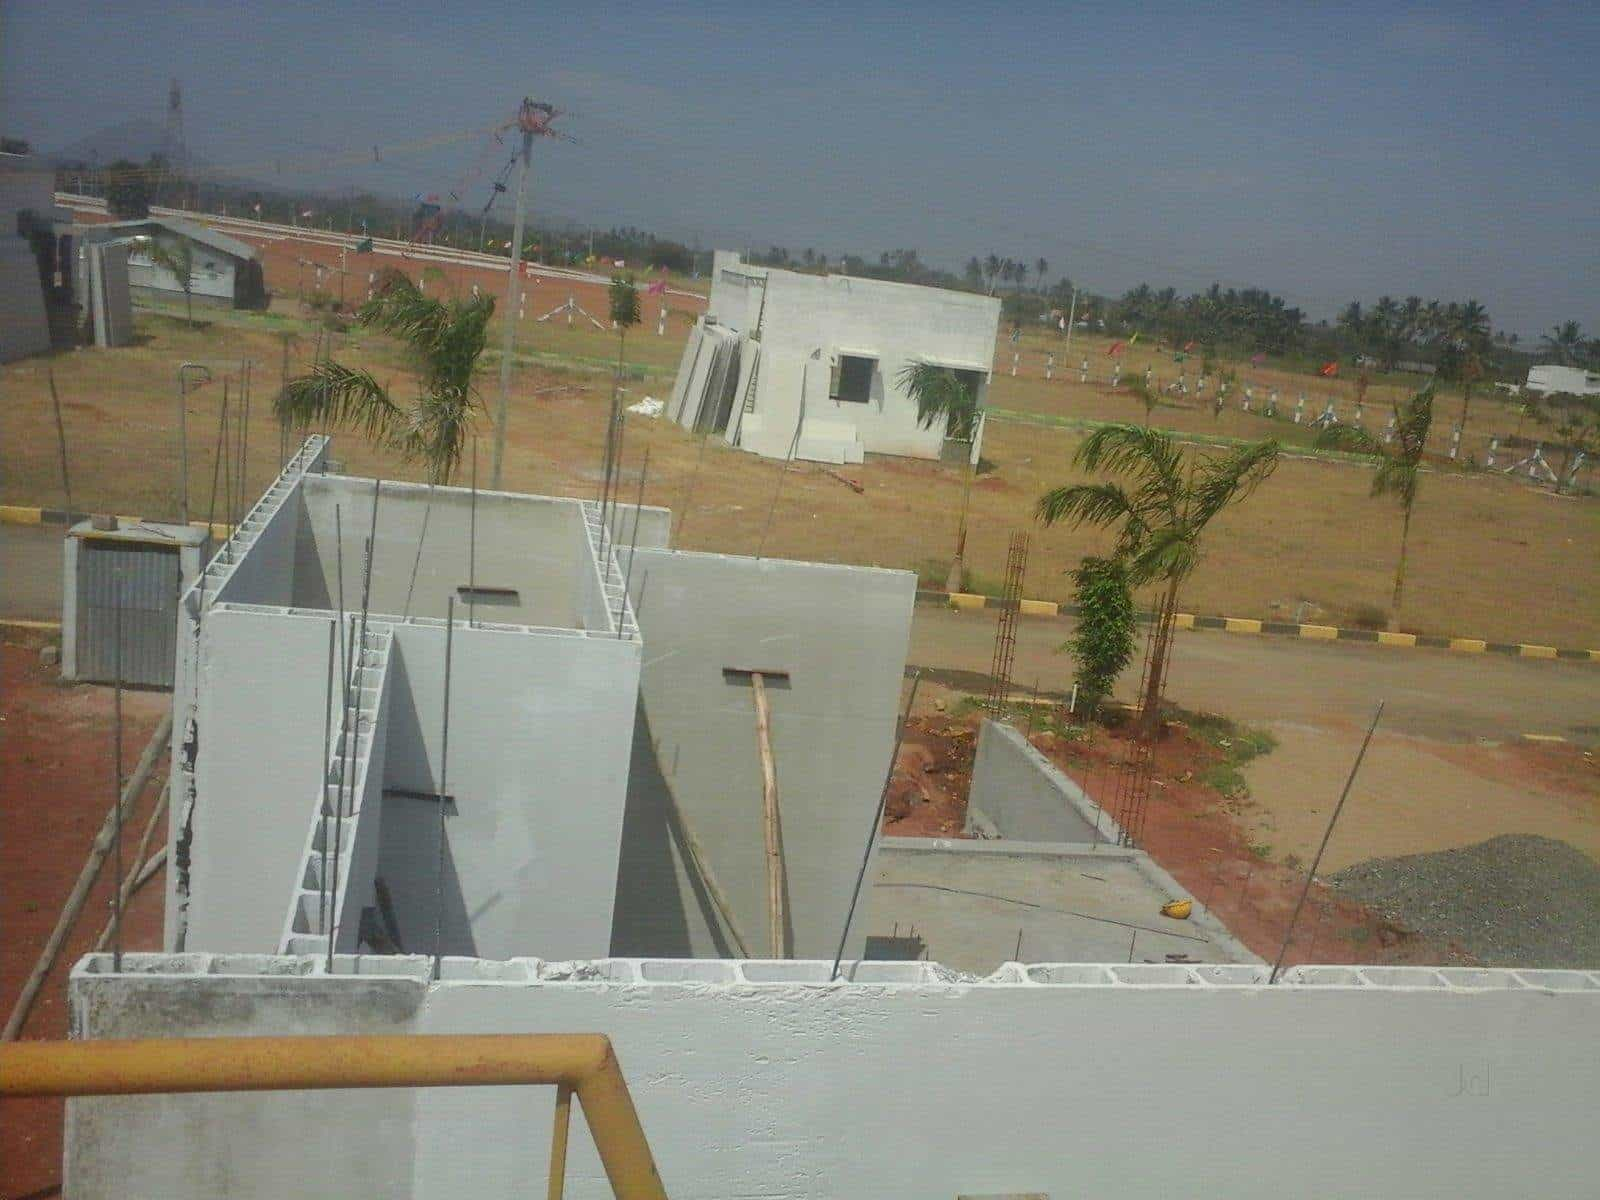 Gfrg Pannel House Construction Coimbatore & Erode, Ramanathapuram